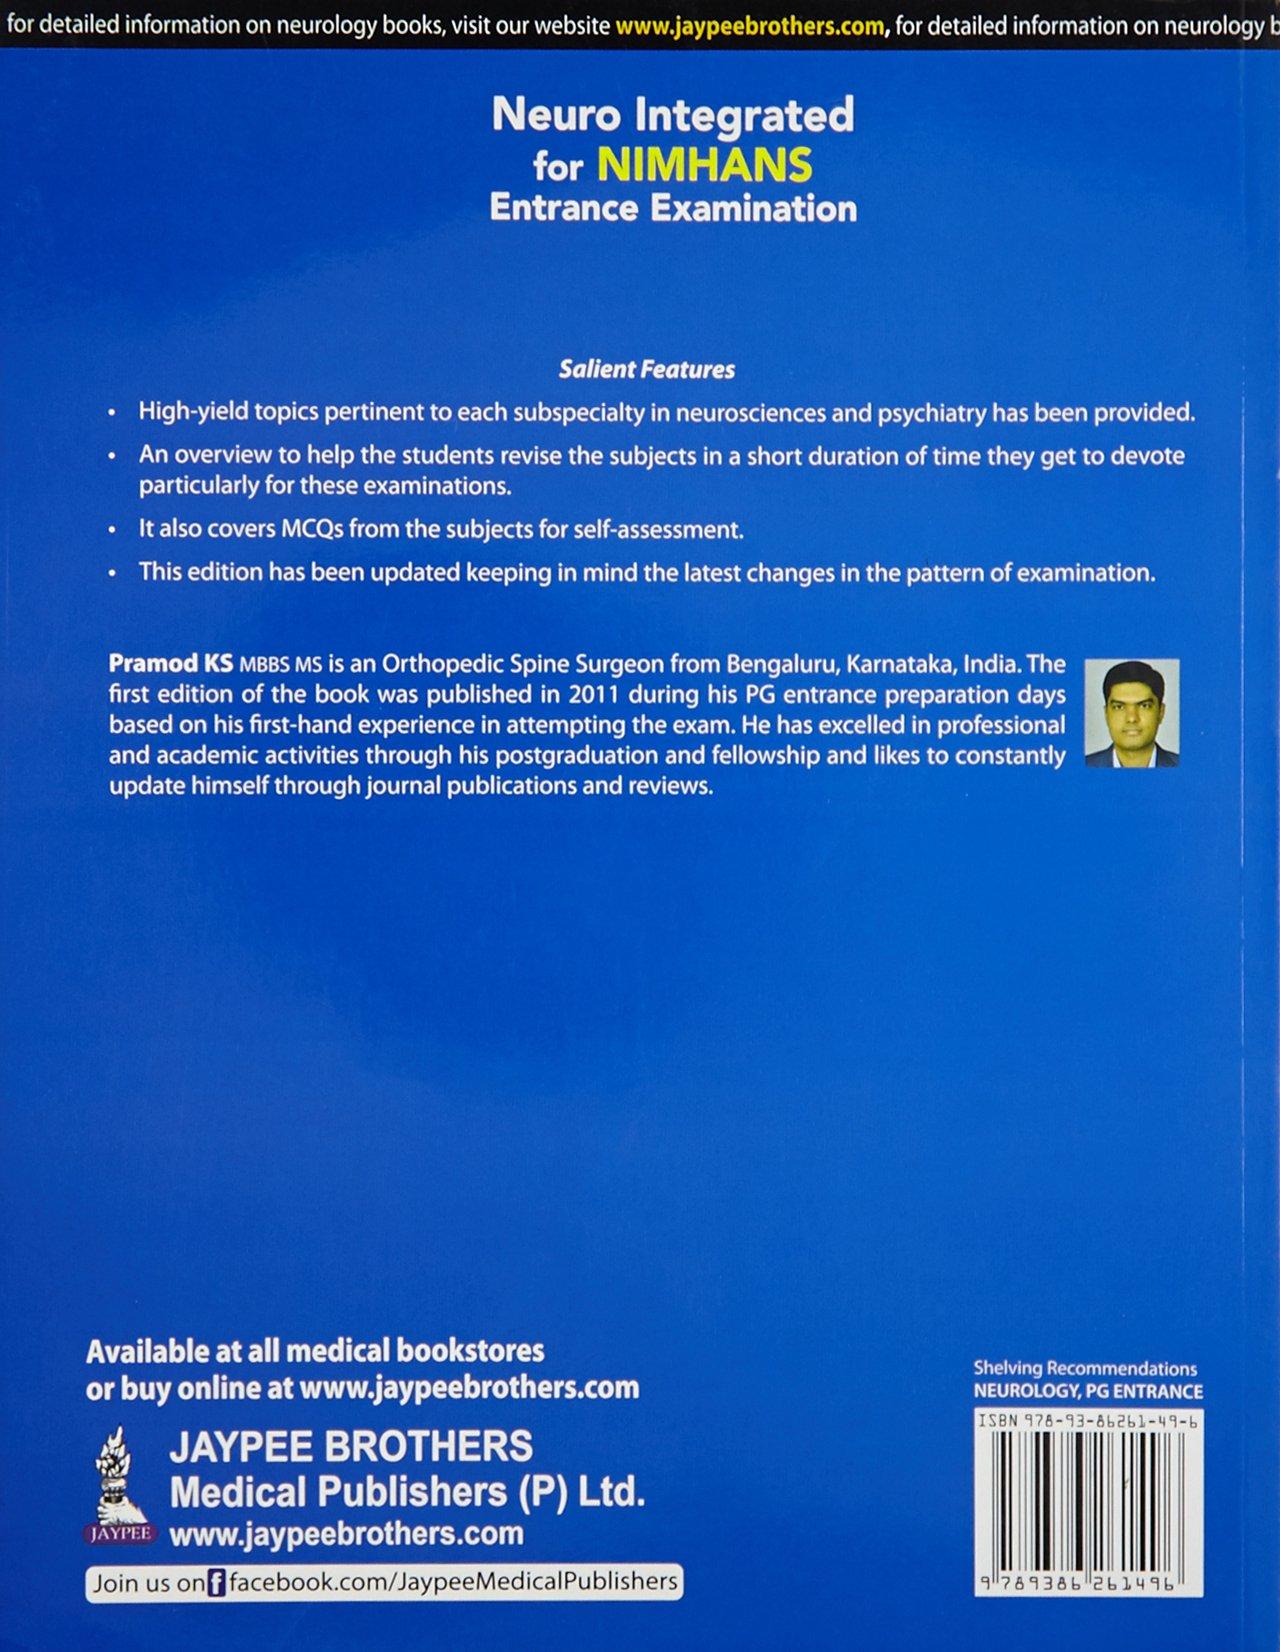 Buy Neuro Integrated for NIMHANS Entrance Examination (PGMEE